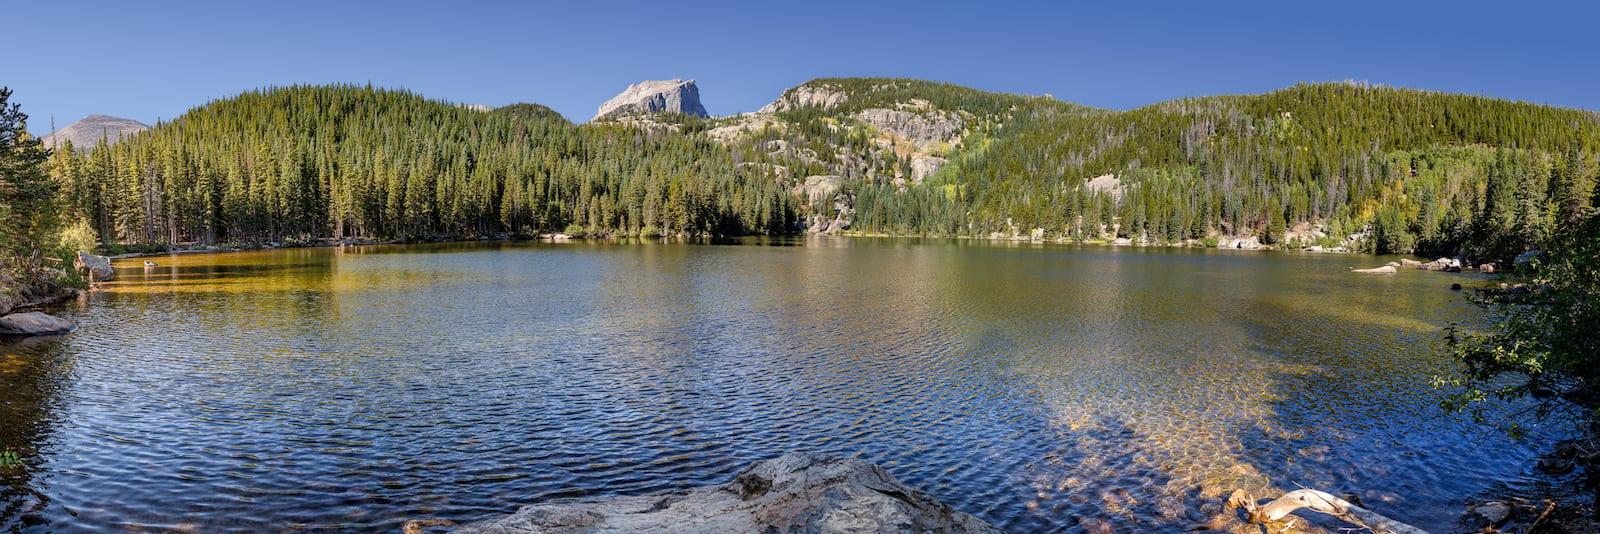 View panorama of Bear Lake, CO